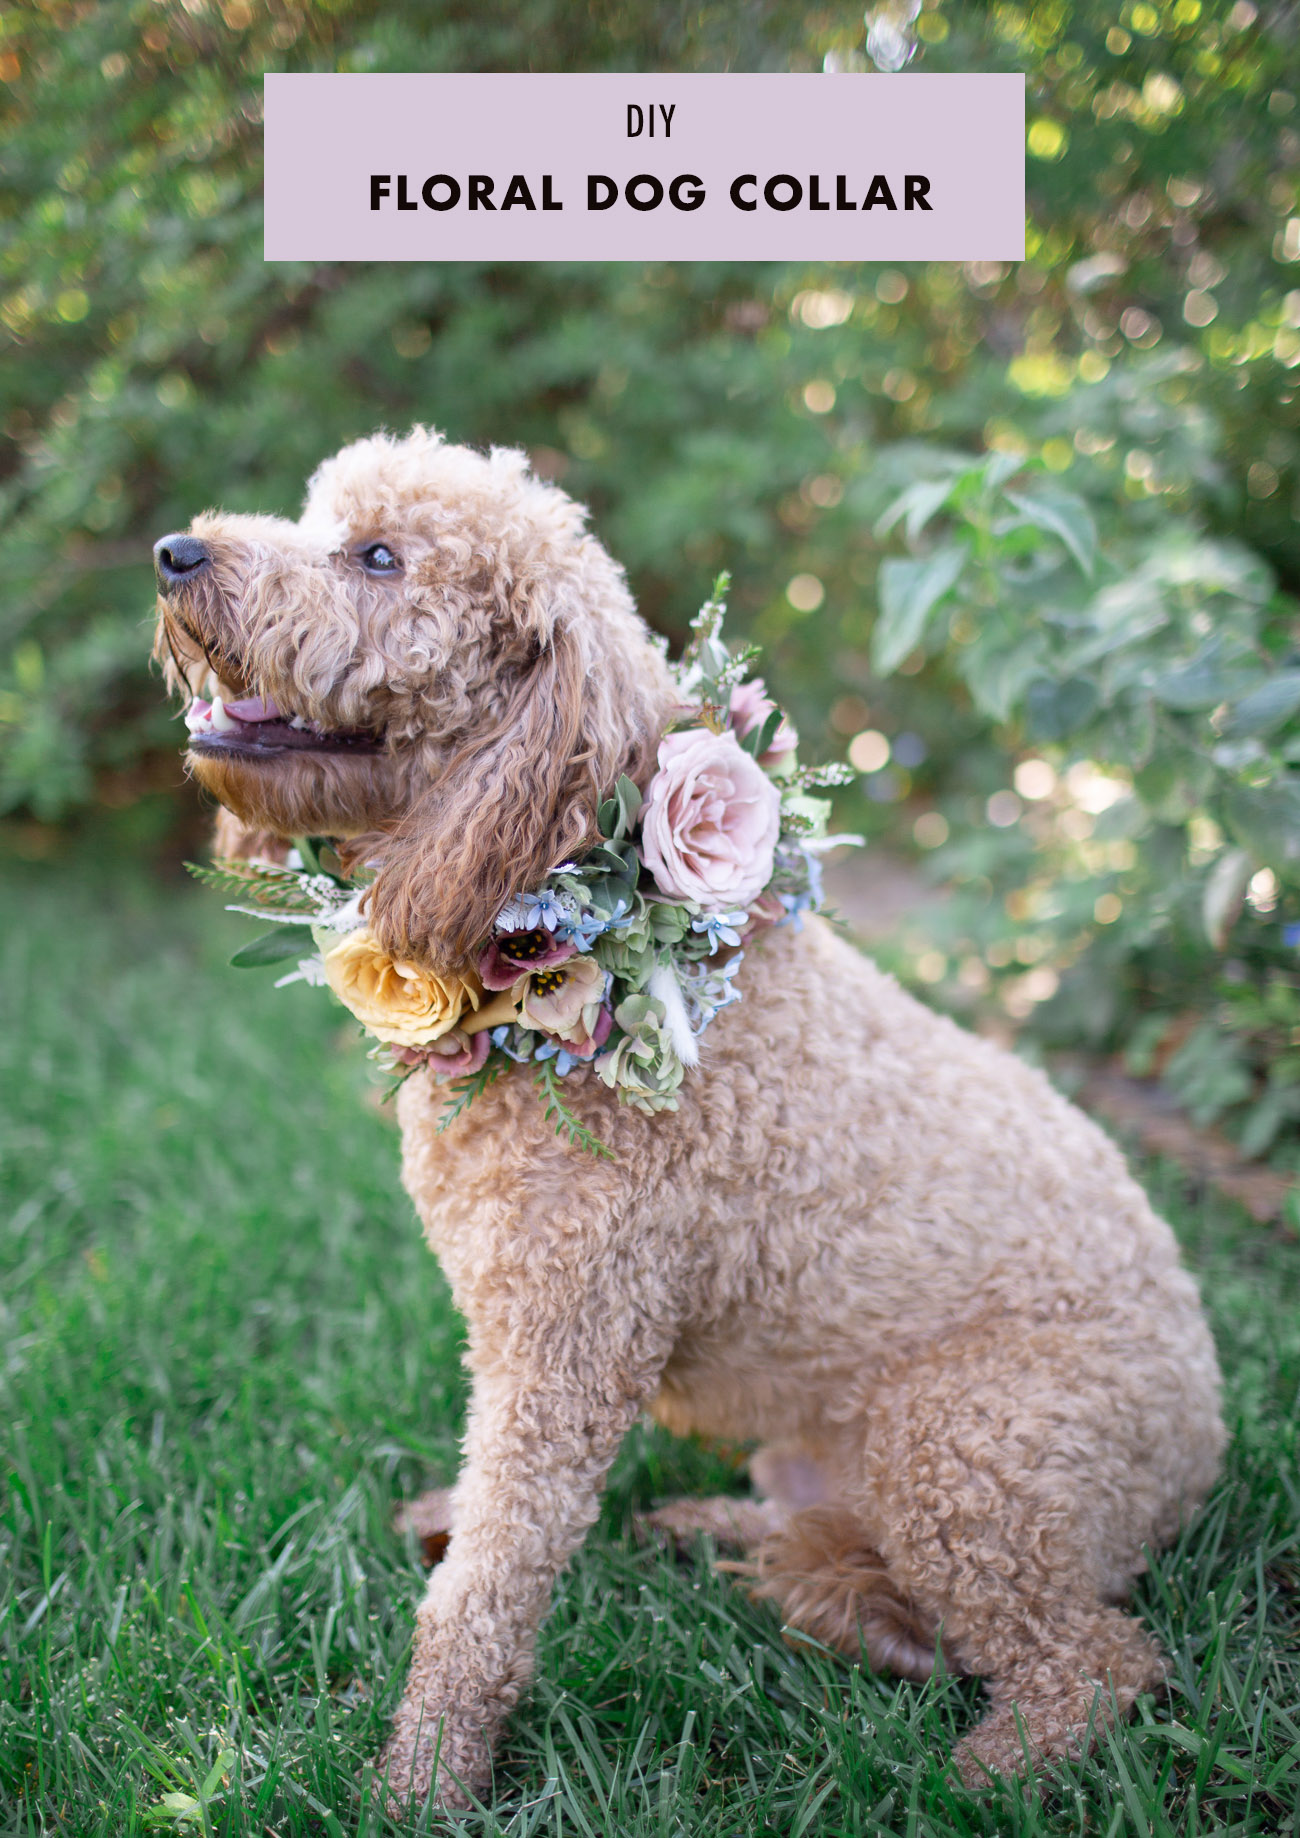 DIY Floral Dog Collar